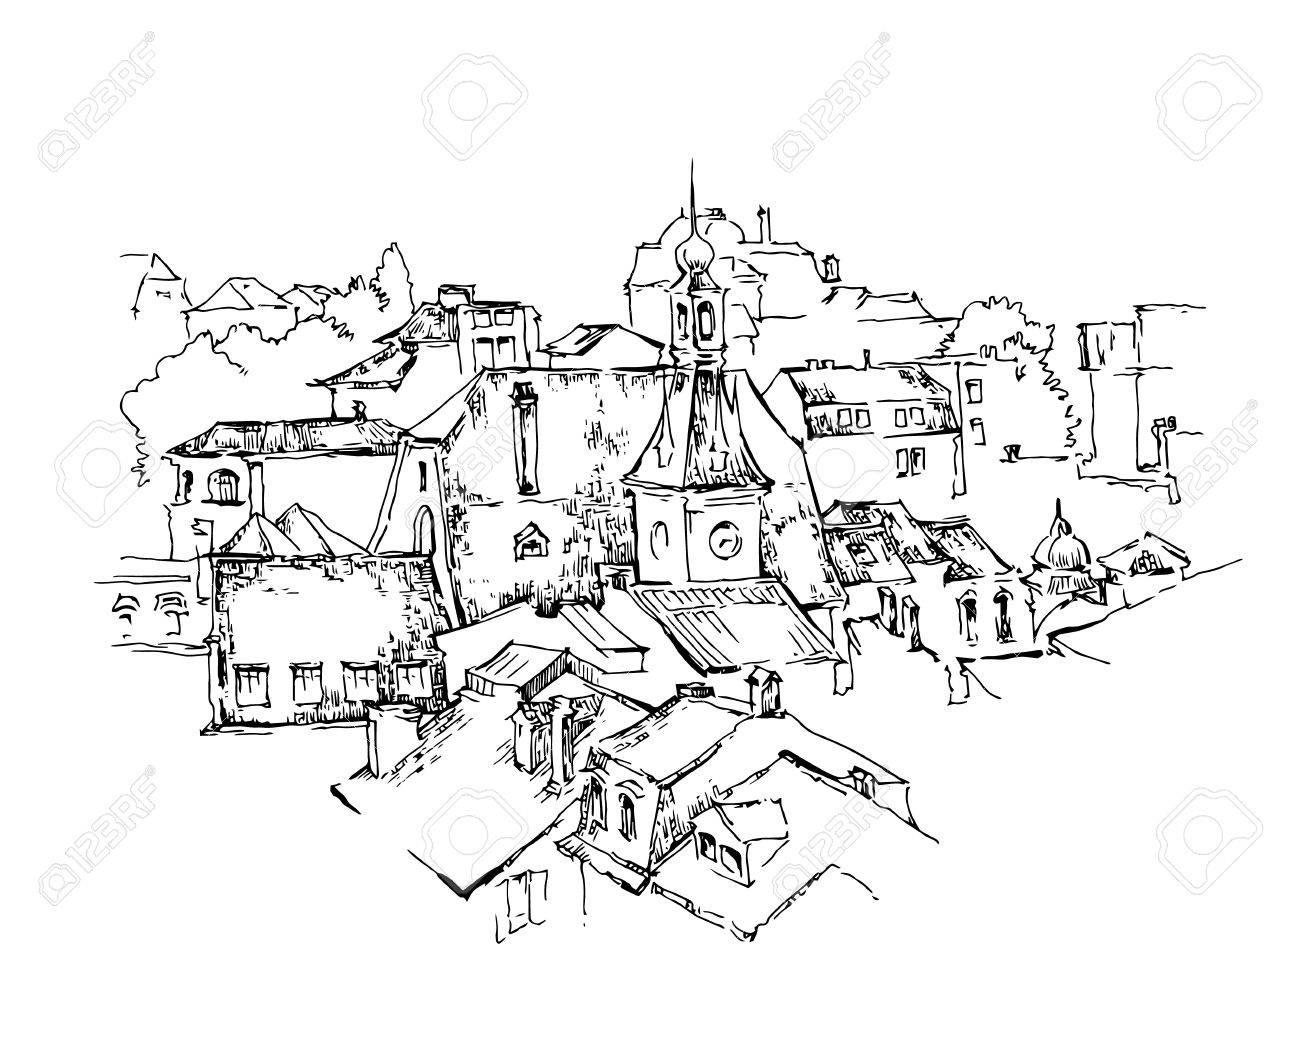 Sketch of old street. Vector illustration made in vintage style. - 45509449